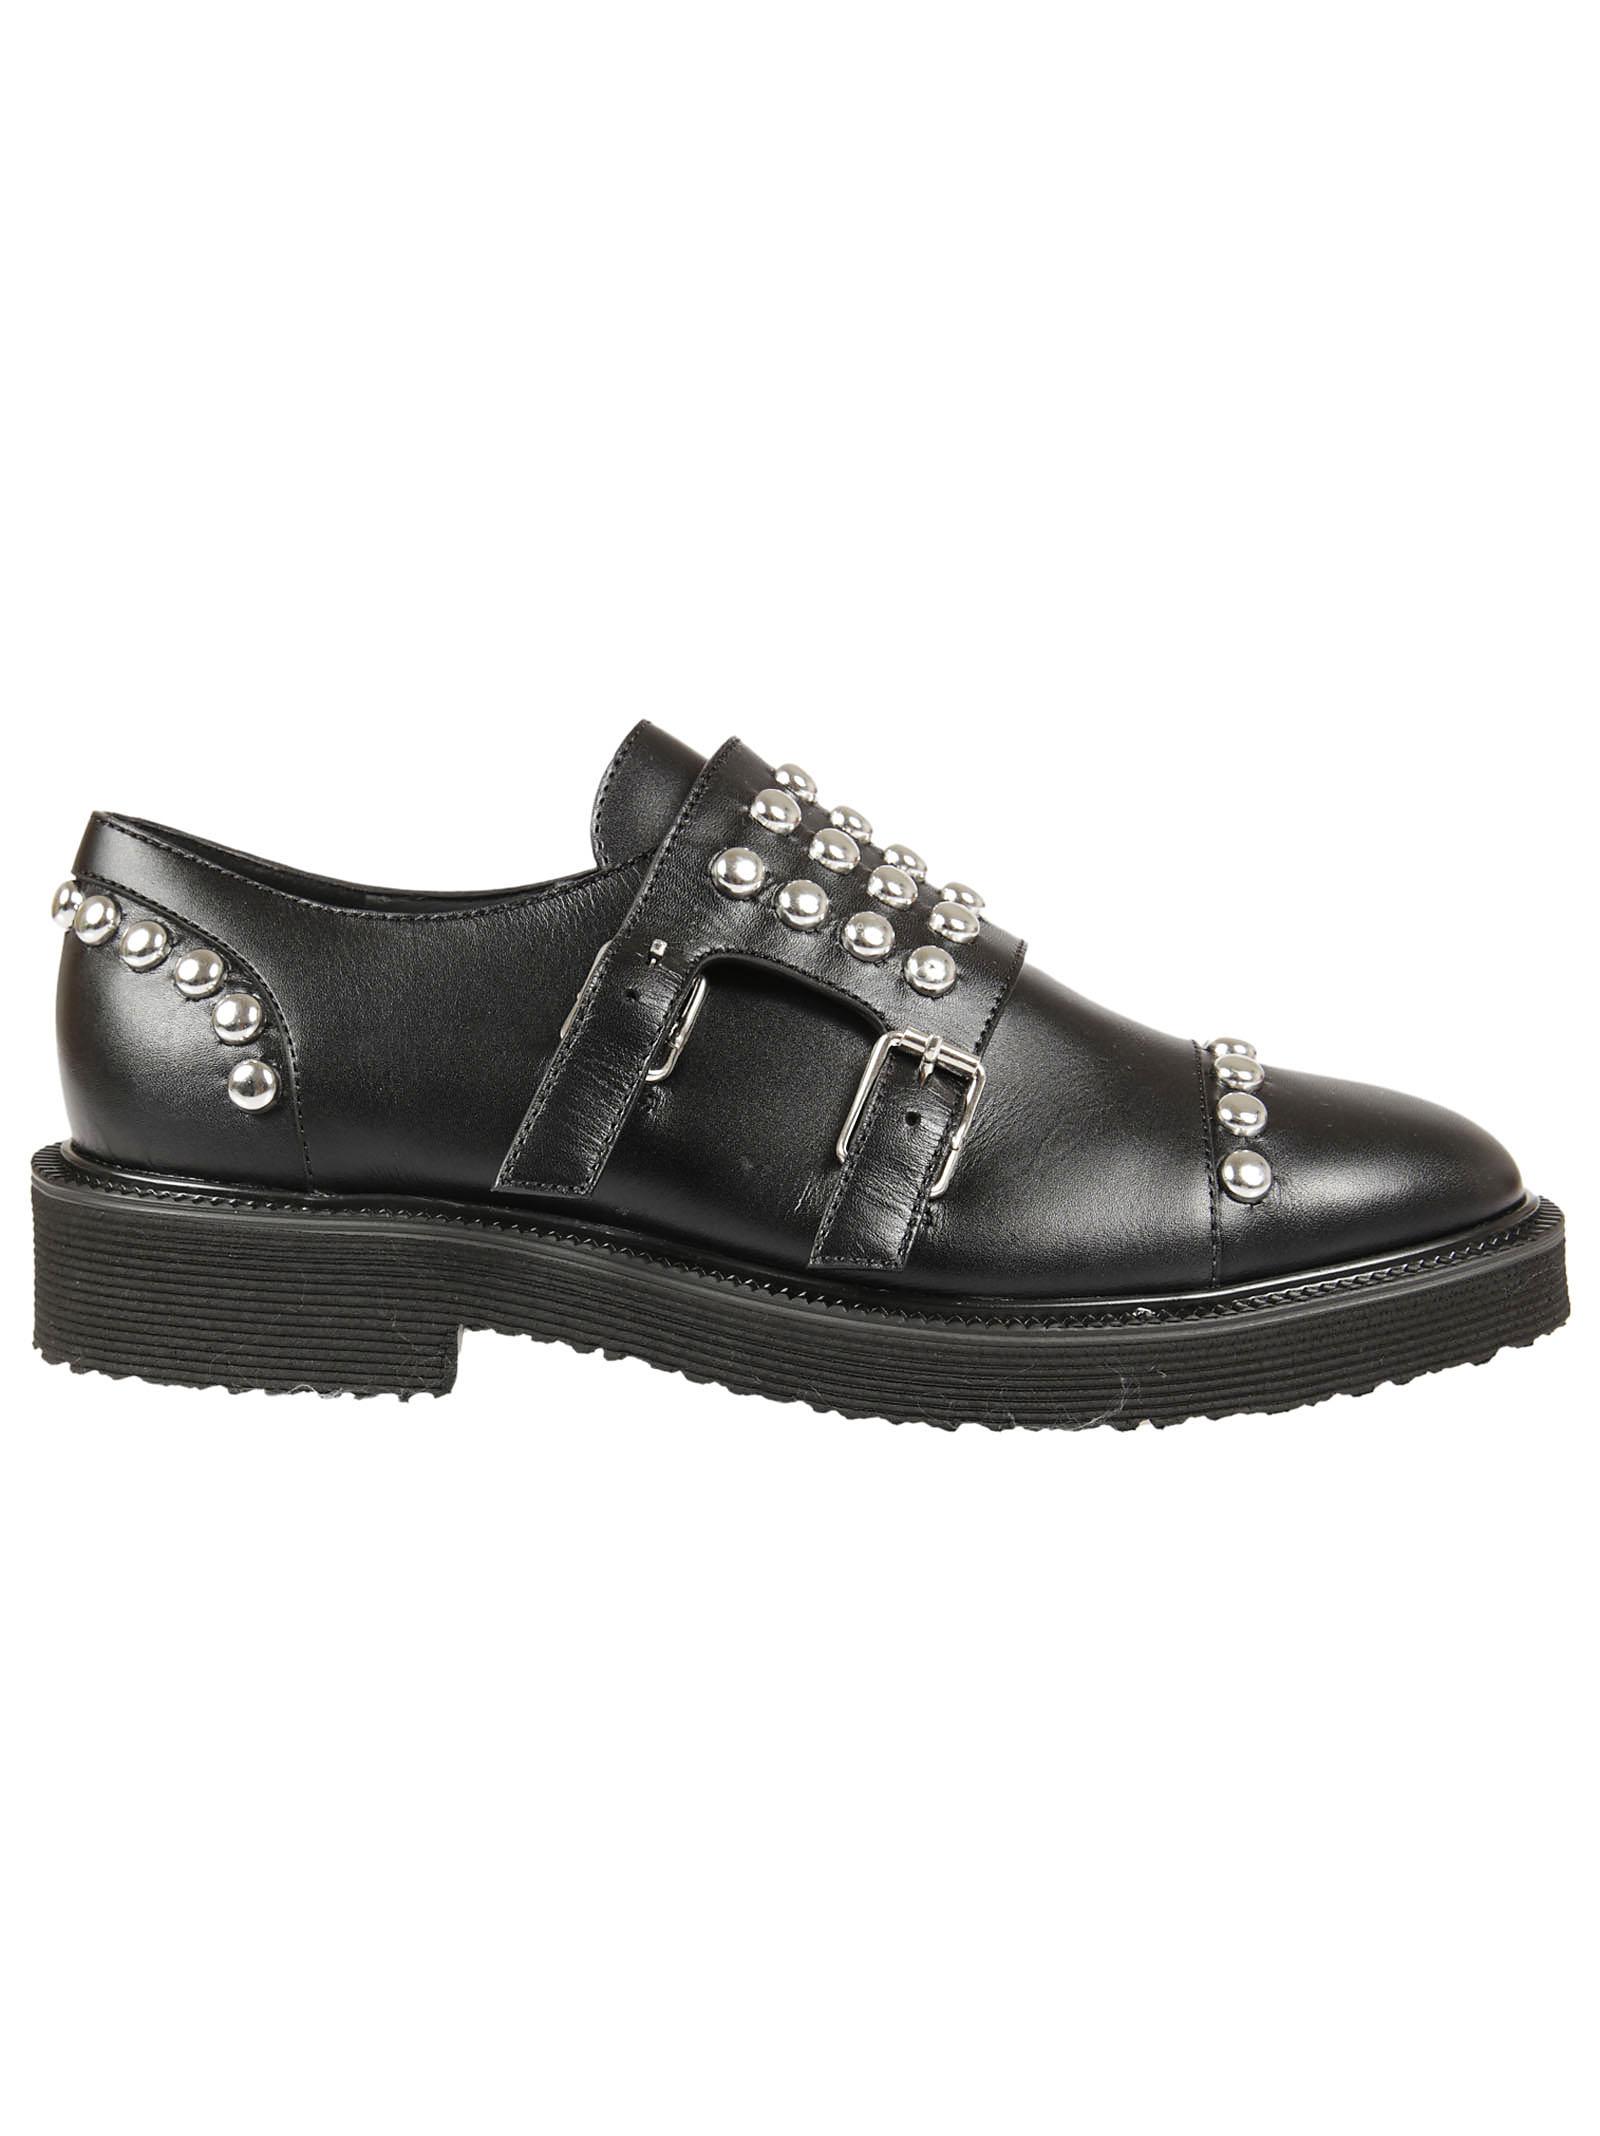 Giuseppe Zanotti Giuseppe Zanotti Studded Monk Shoes